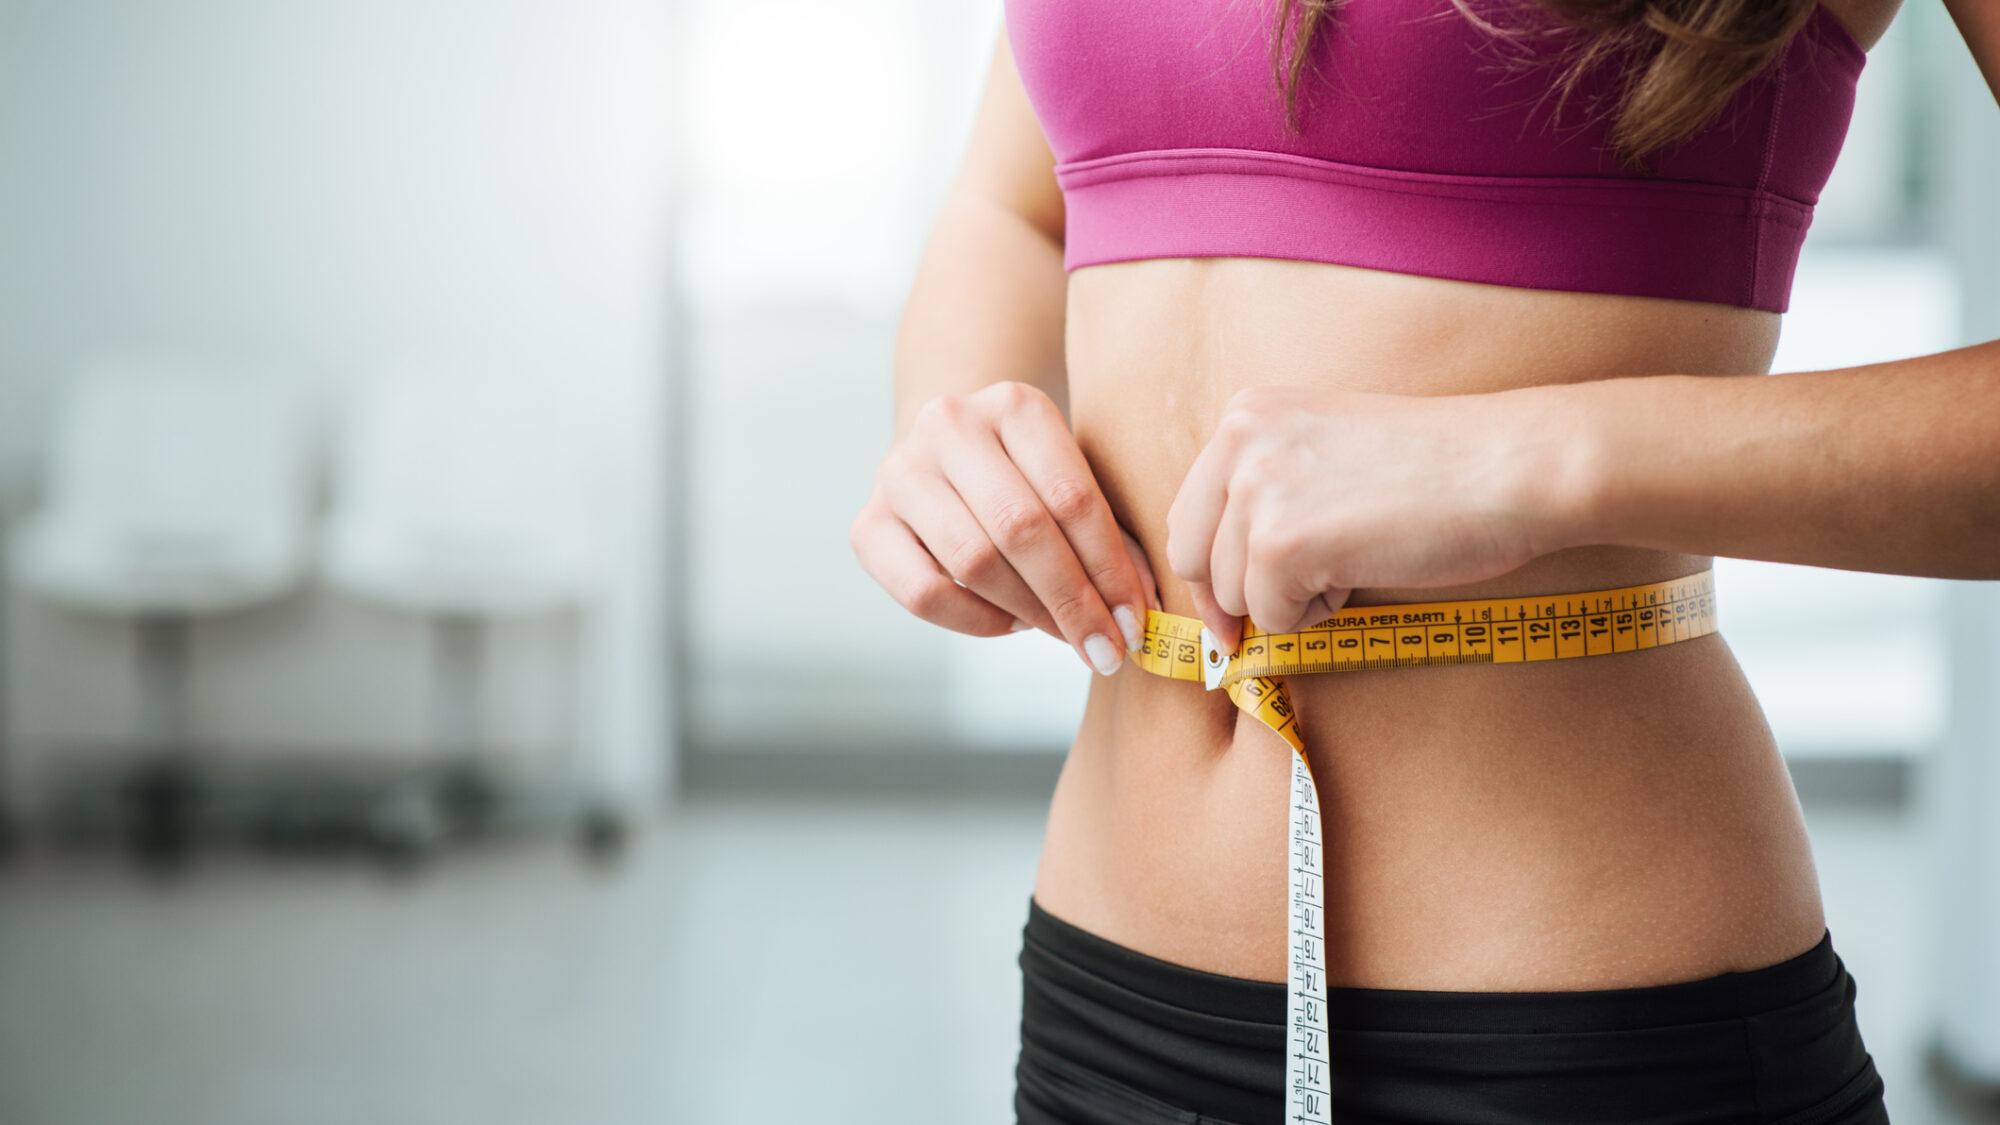 Peso dieta runners perder